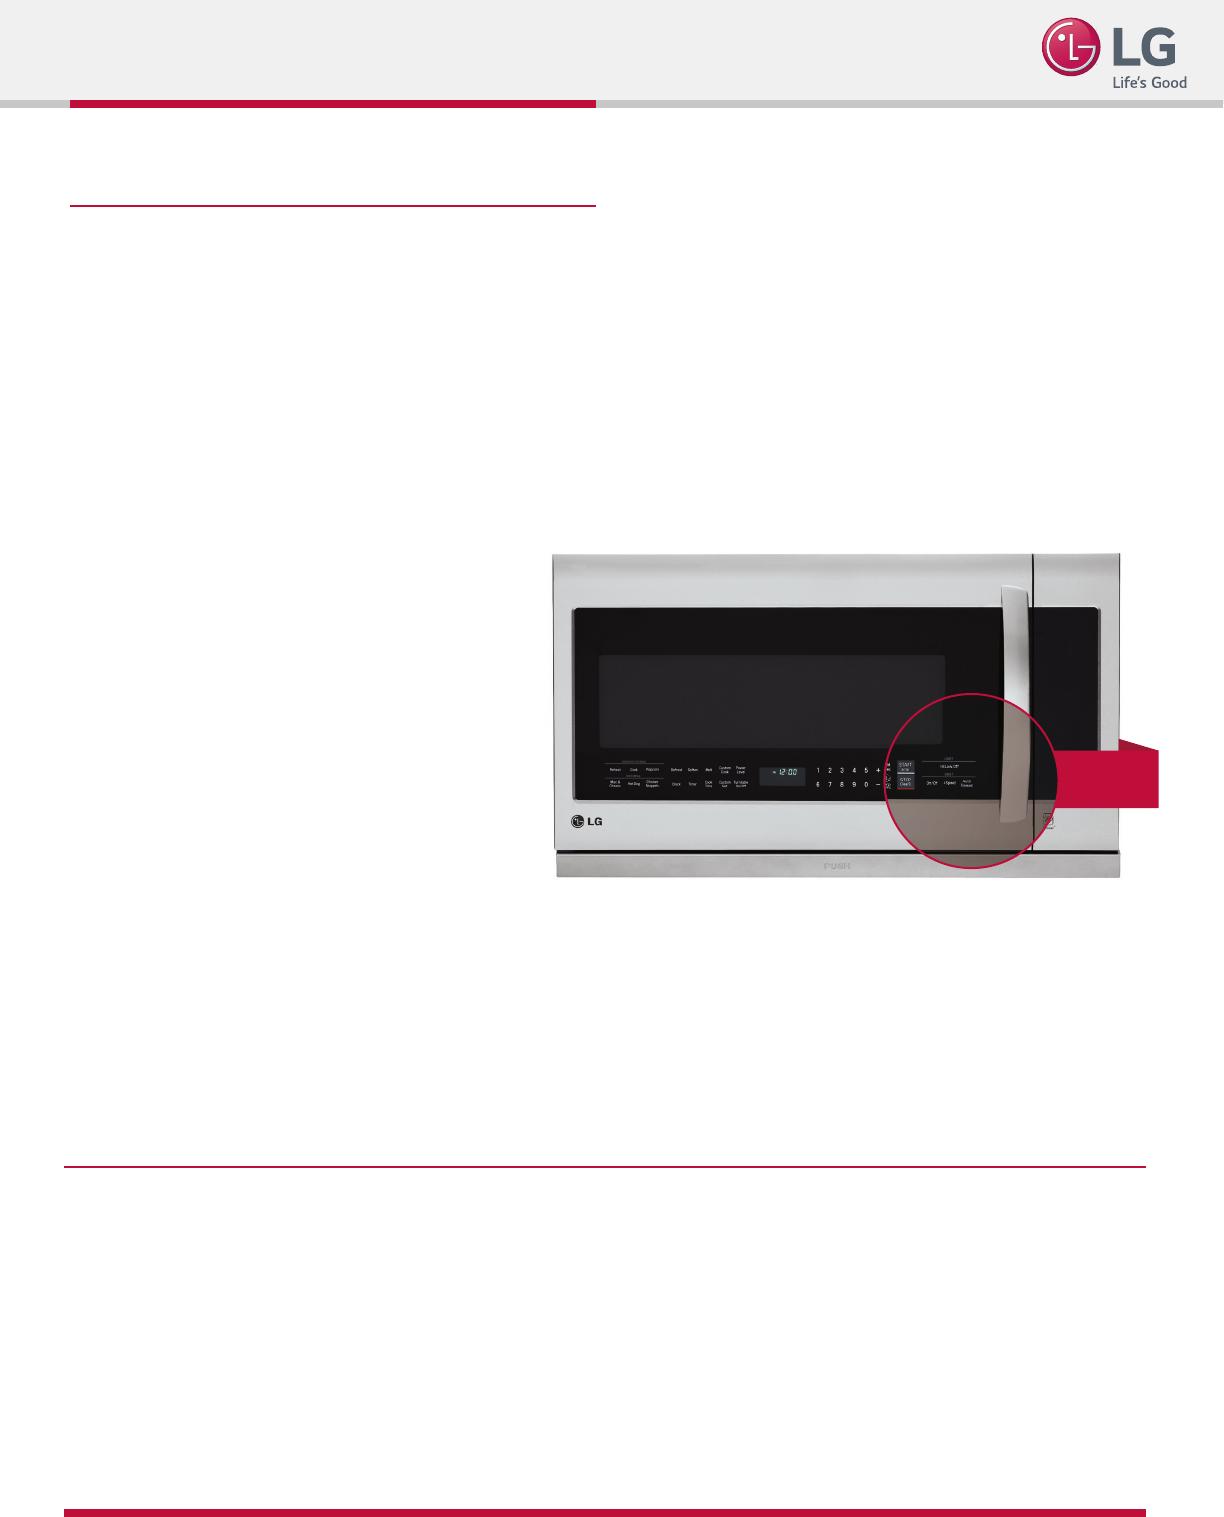 LG LMHM2237BD User Manual Specification LMHM2237 Spec Sheet